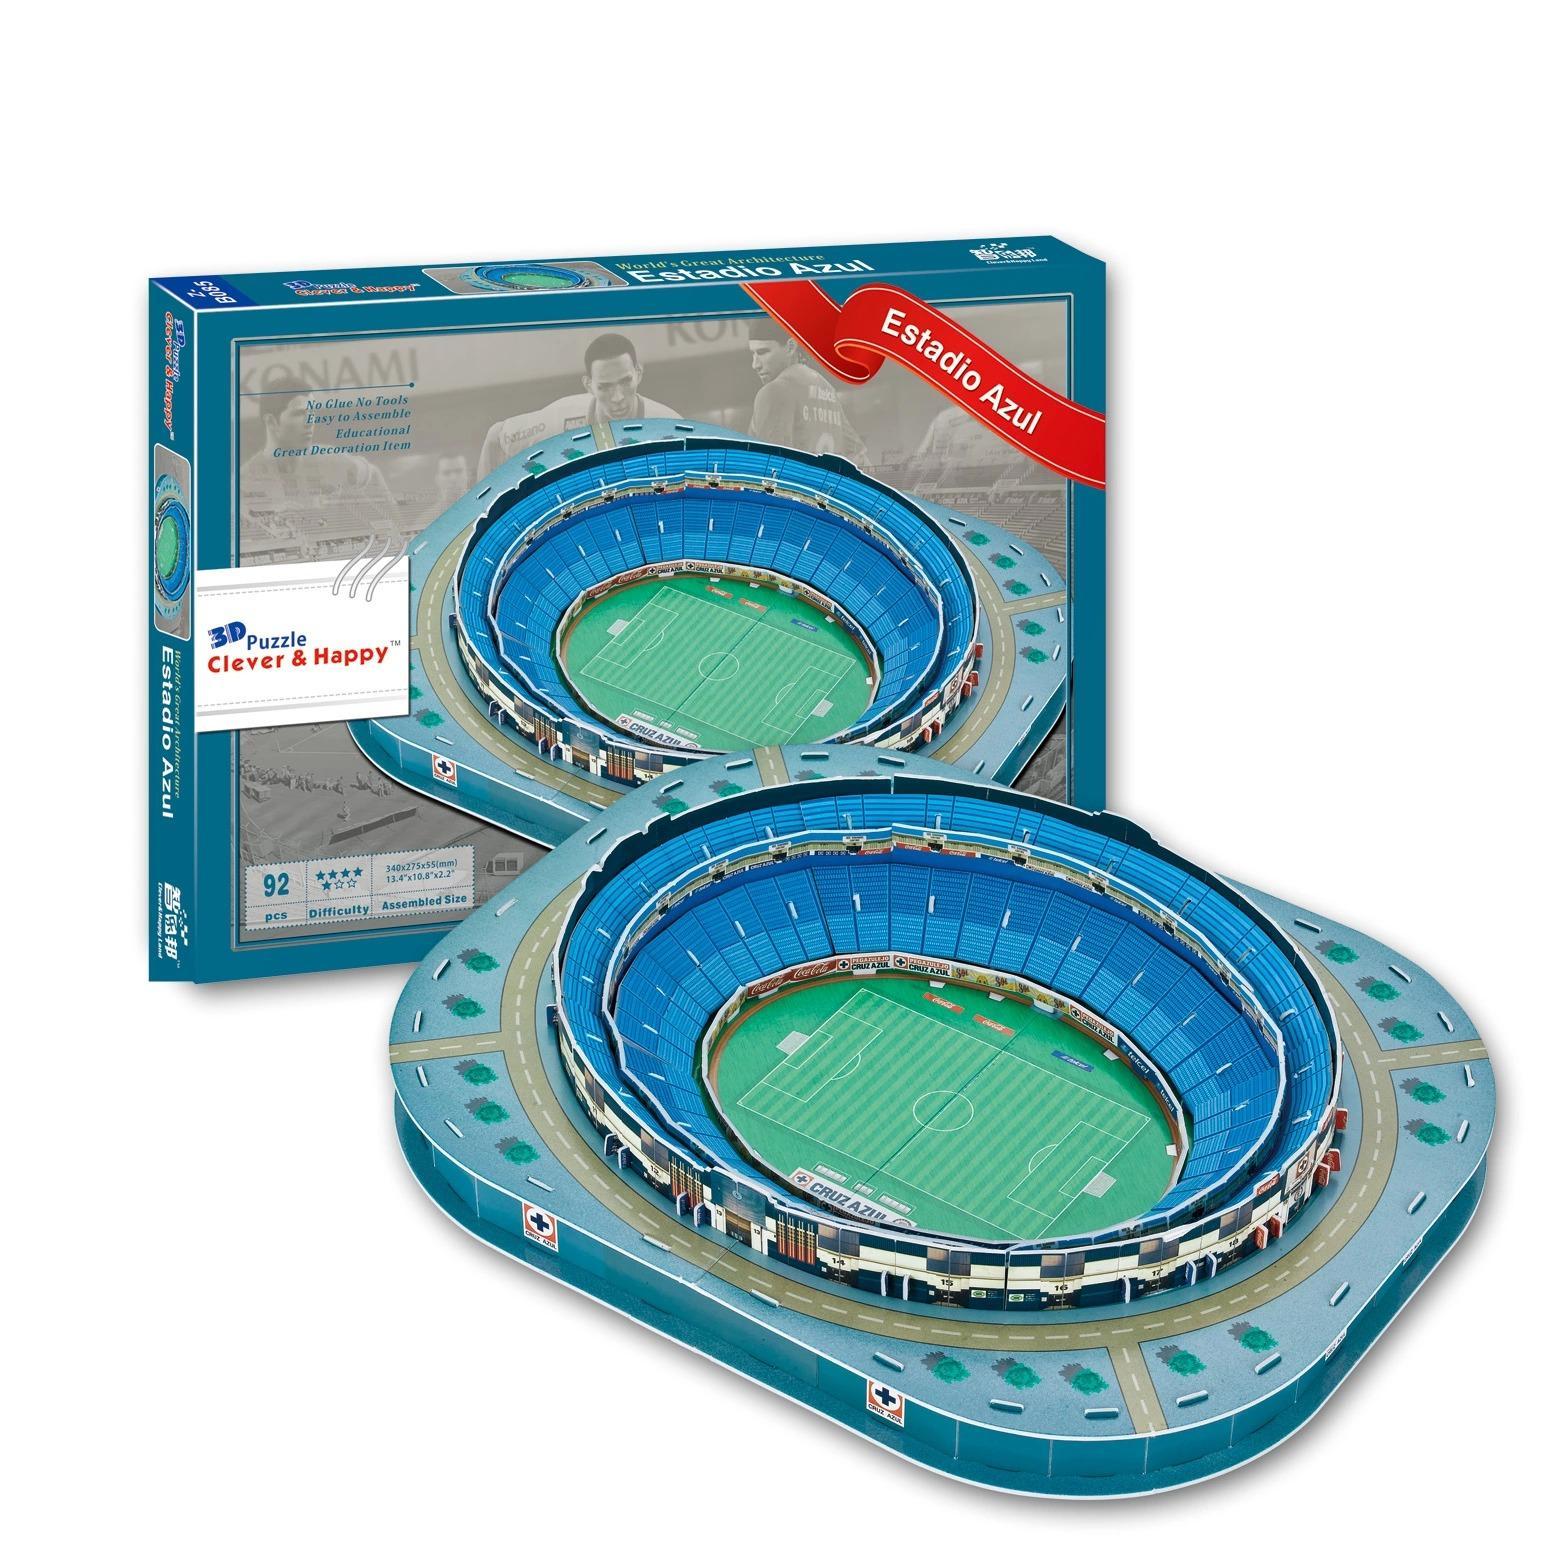 3D Puzzle Mexico Estadio Azul Stadium Model For Kids EducationalToy